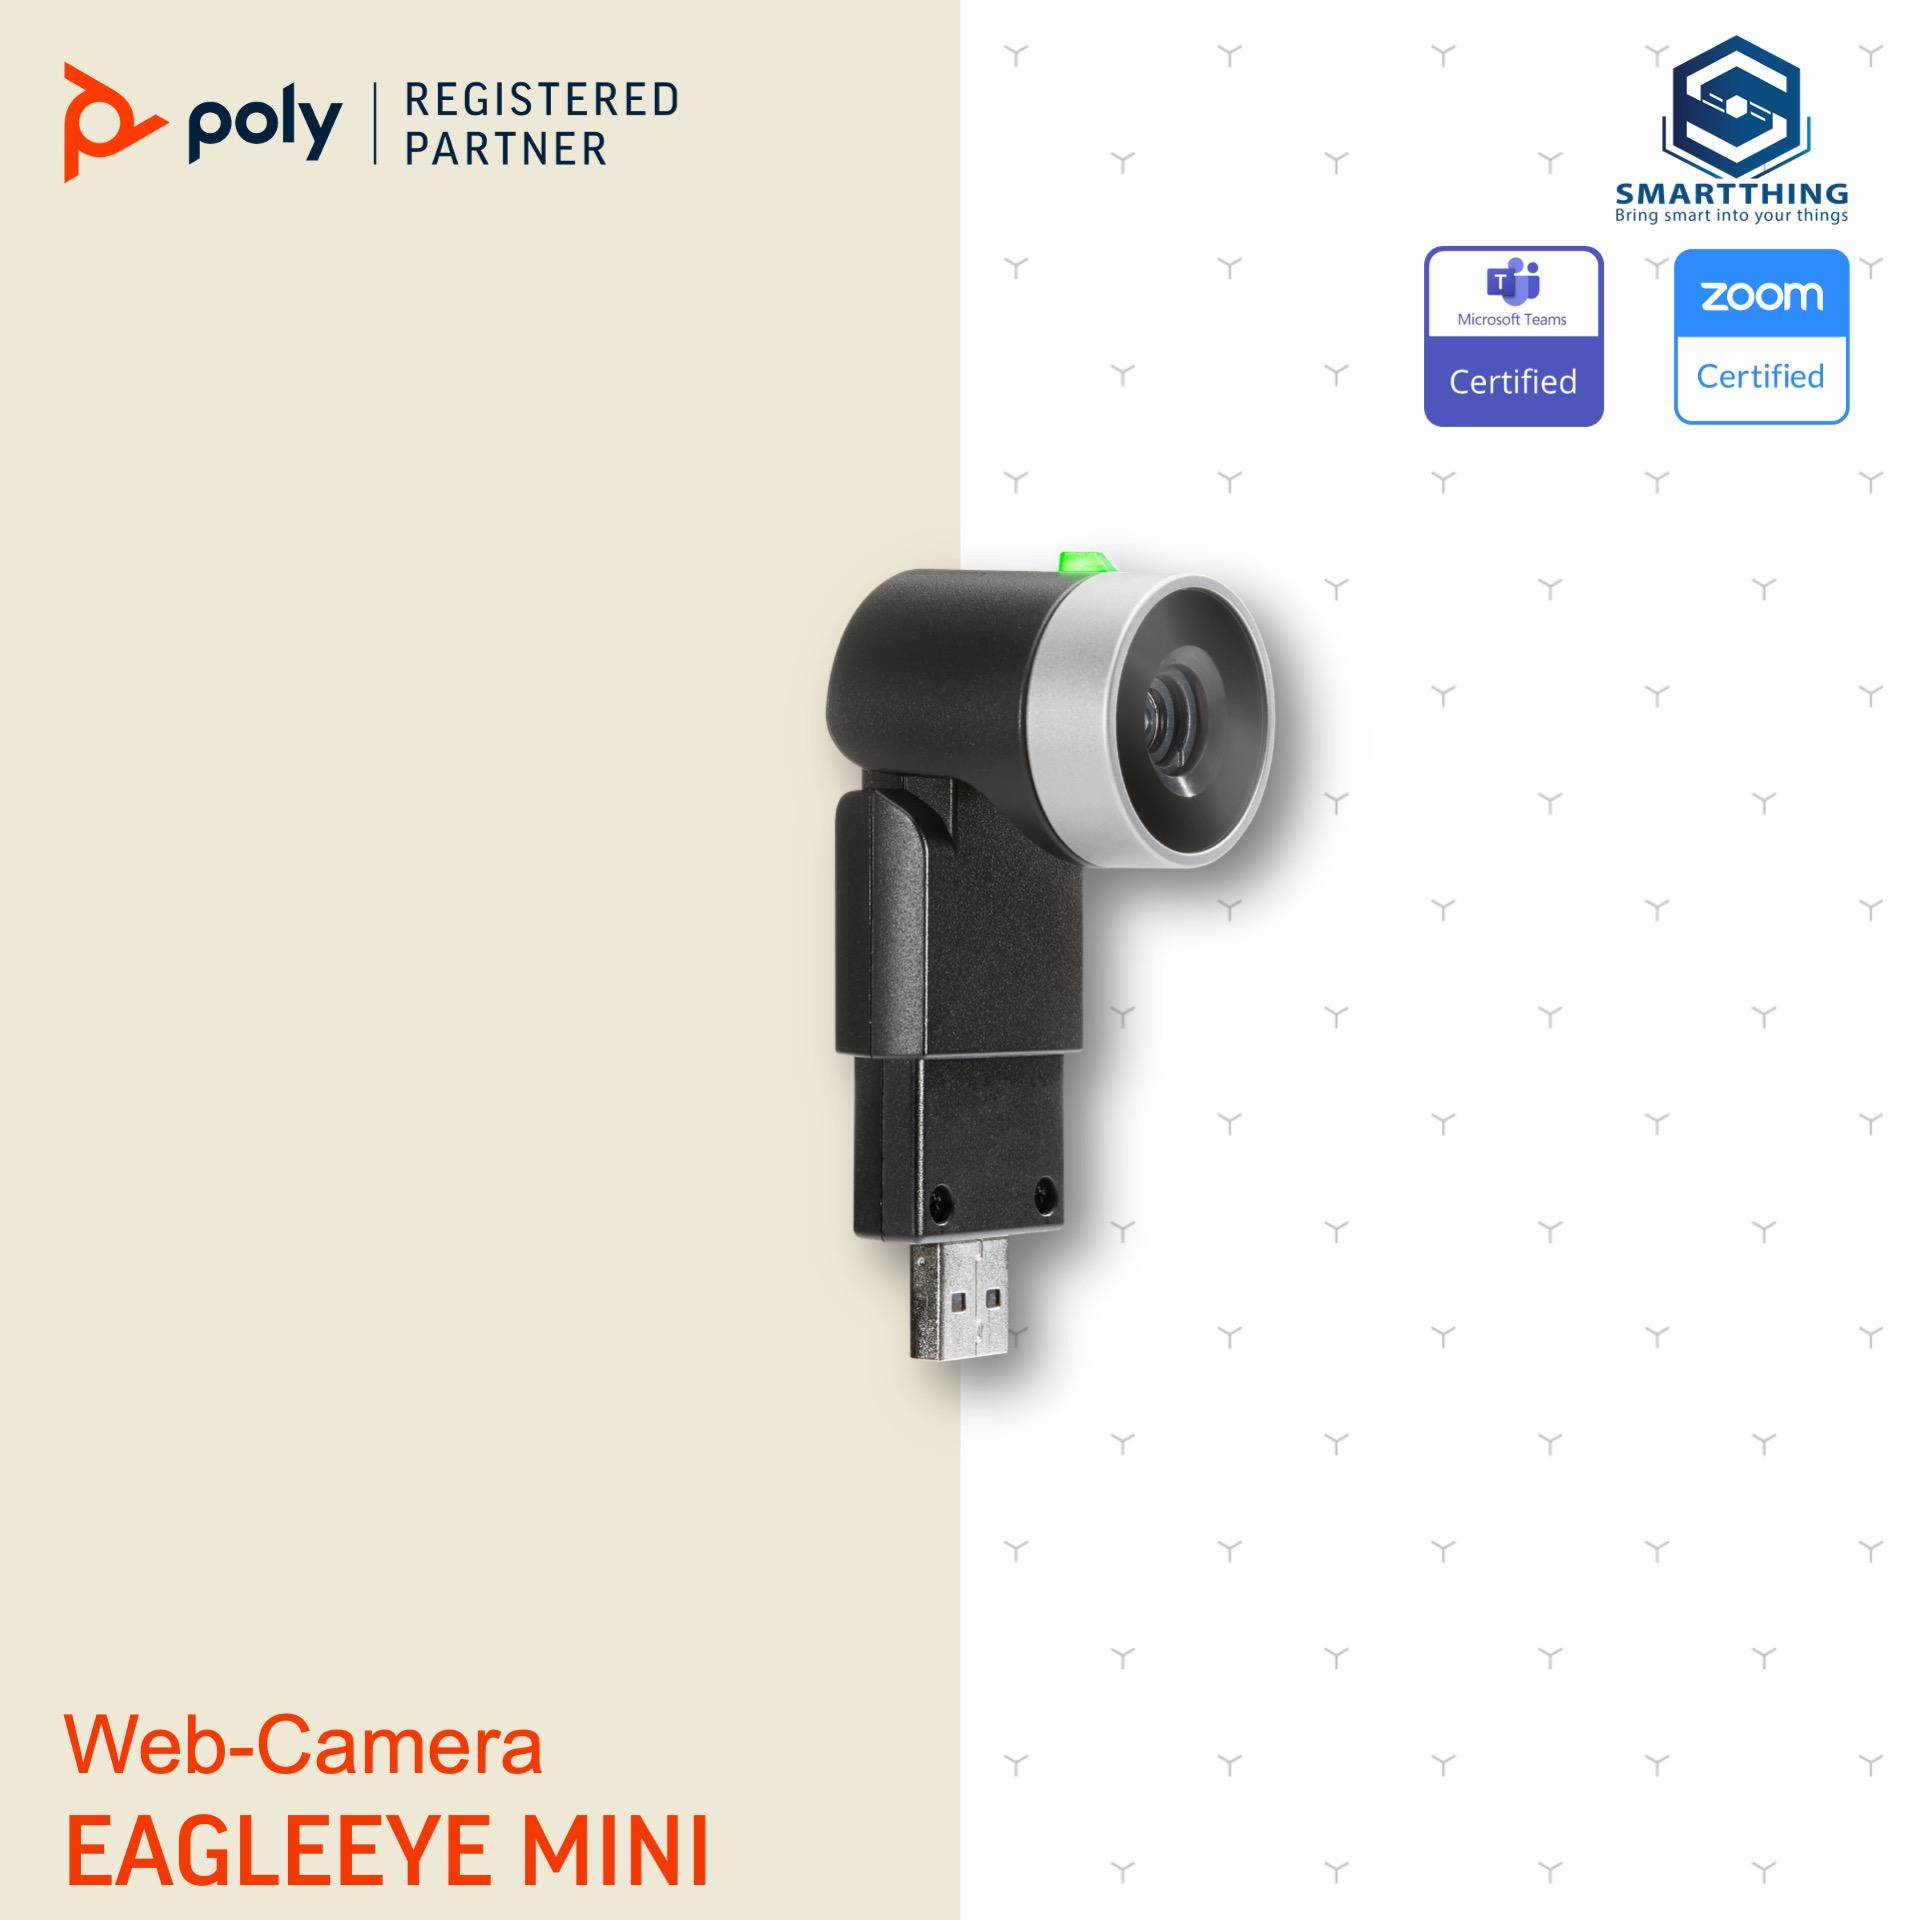 Poly EagleEye Mini